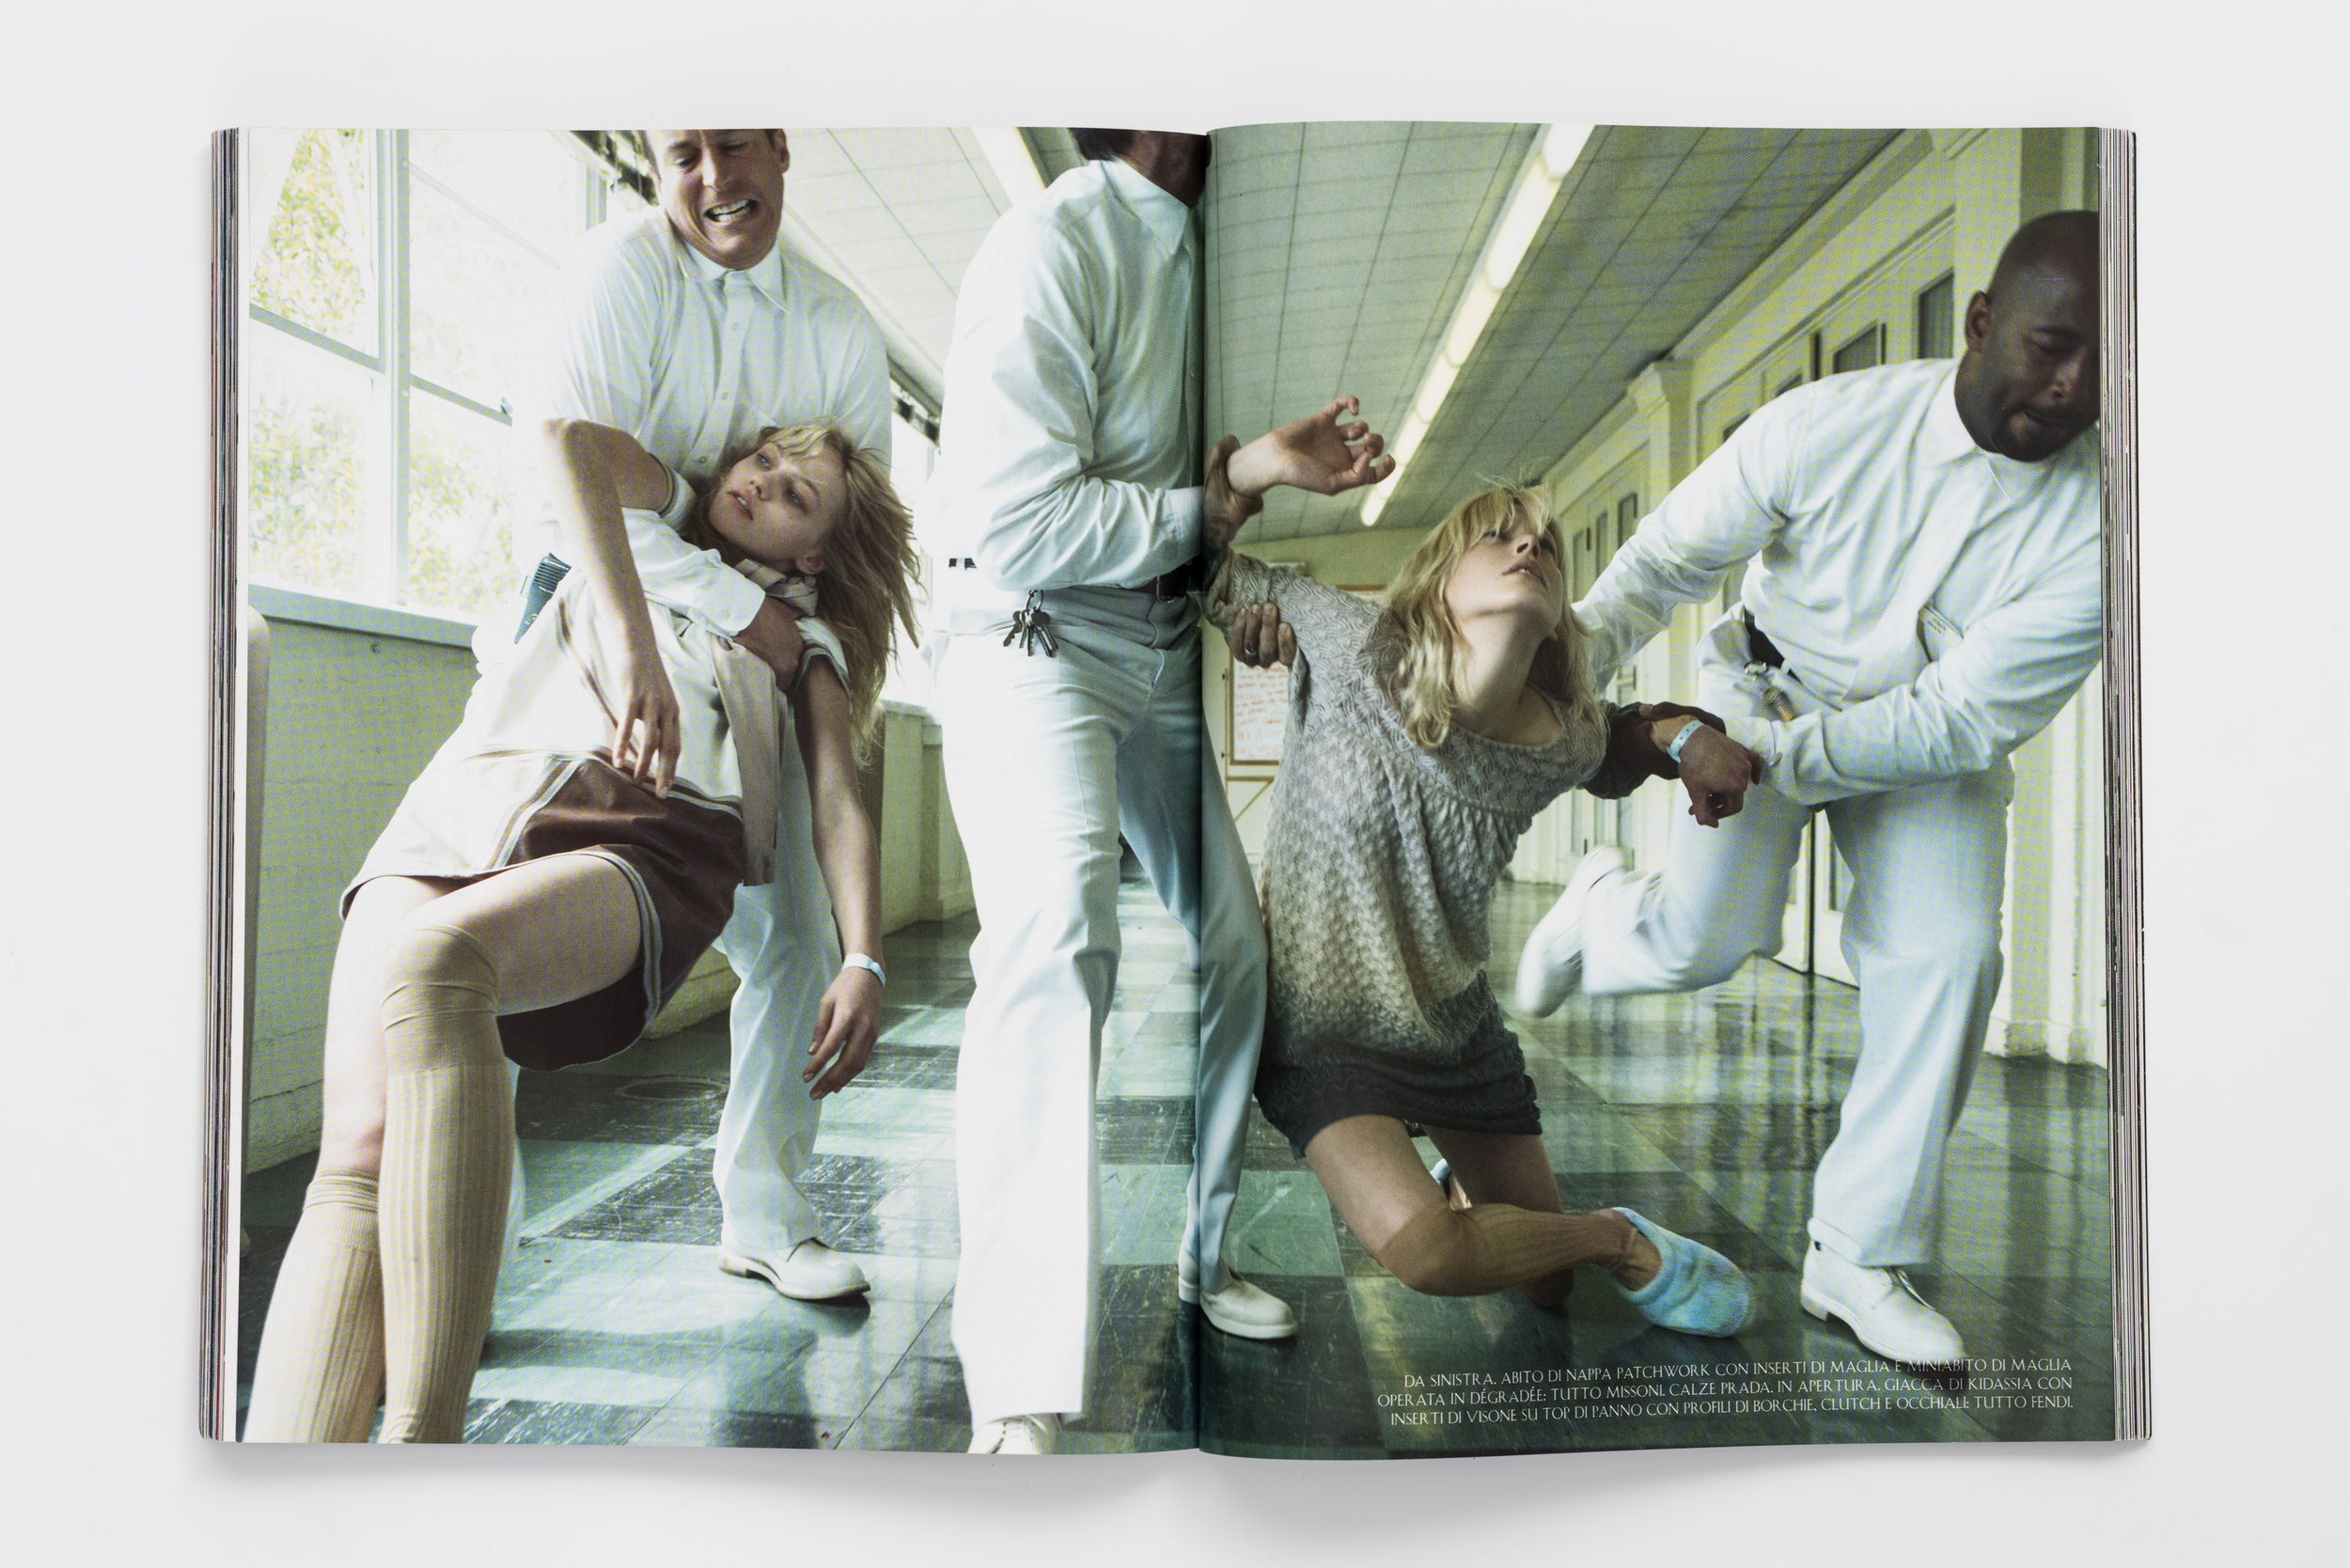 Iselin Steiro_Steven Meisel_Vogue Italia_Supermods Enter Rehab_2.jpg